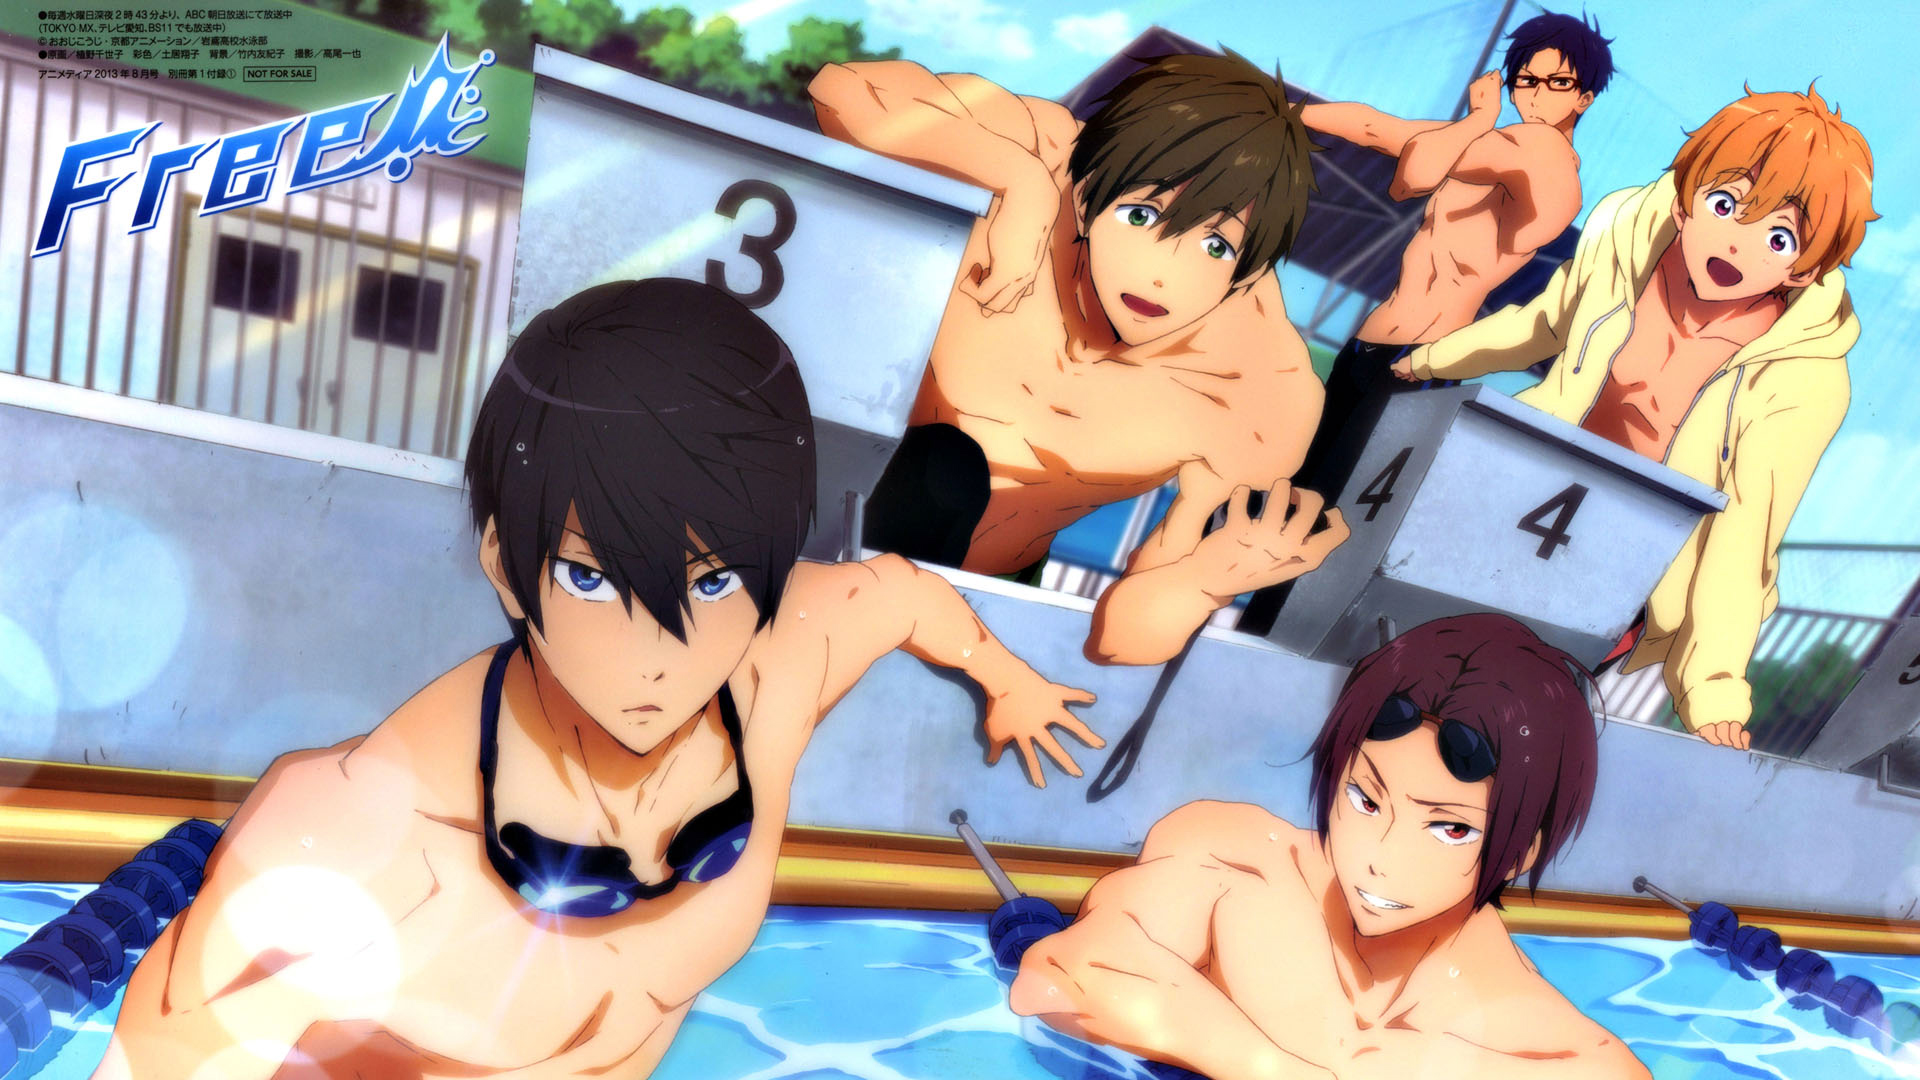 Nagisa Hazuki Rei Ryugazaki Anime Iwatobi Swim Club Anime 1920x1080